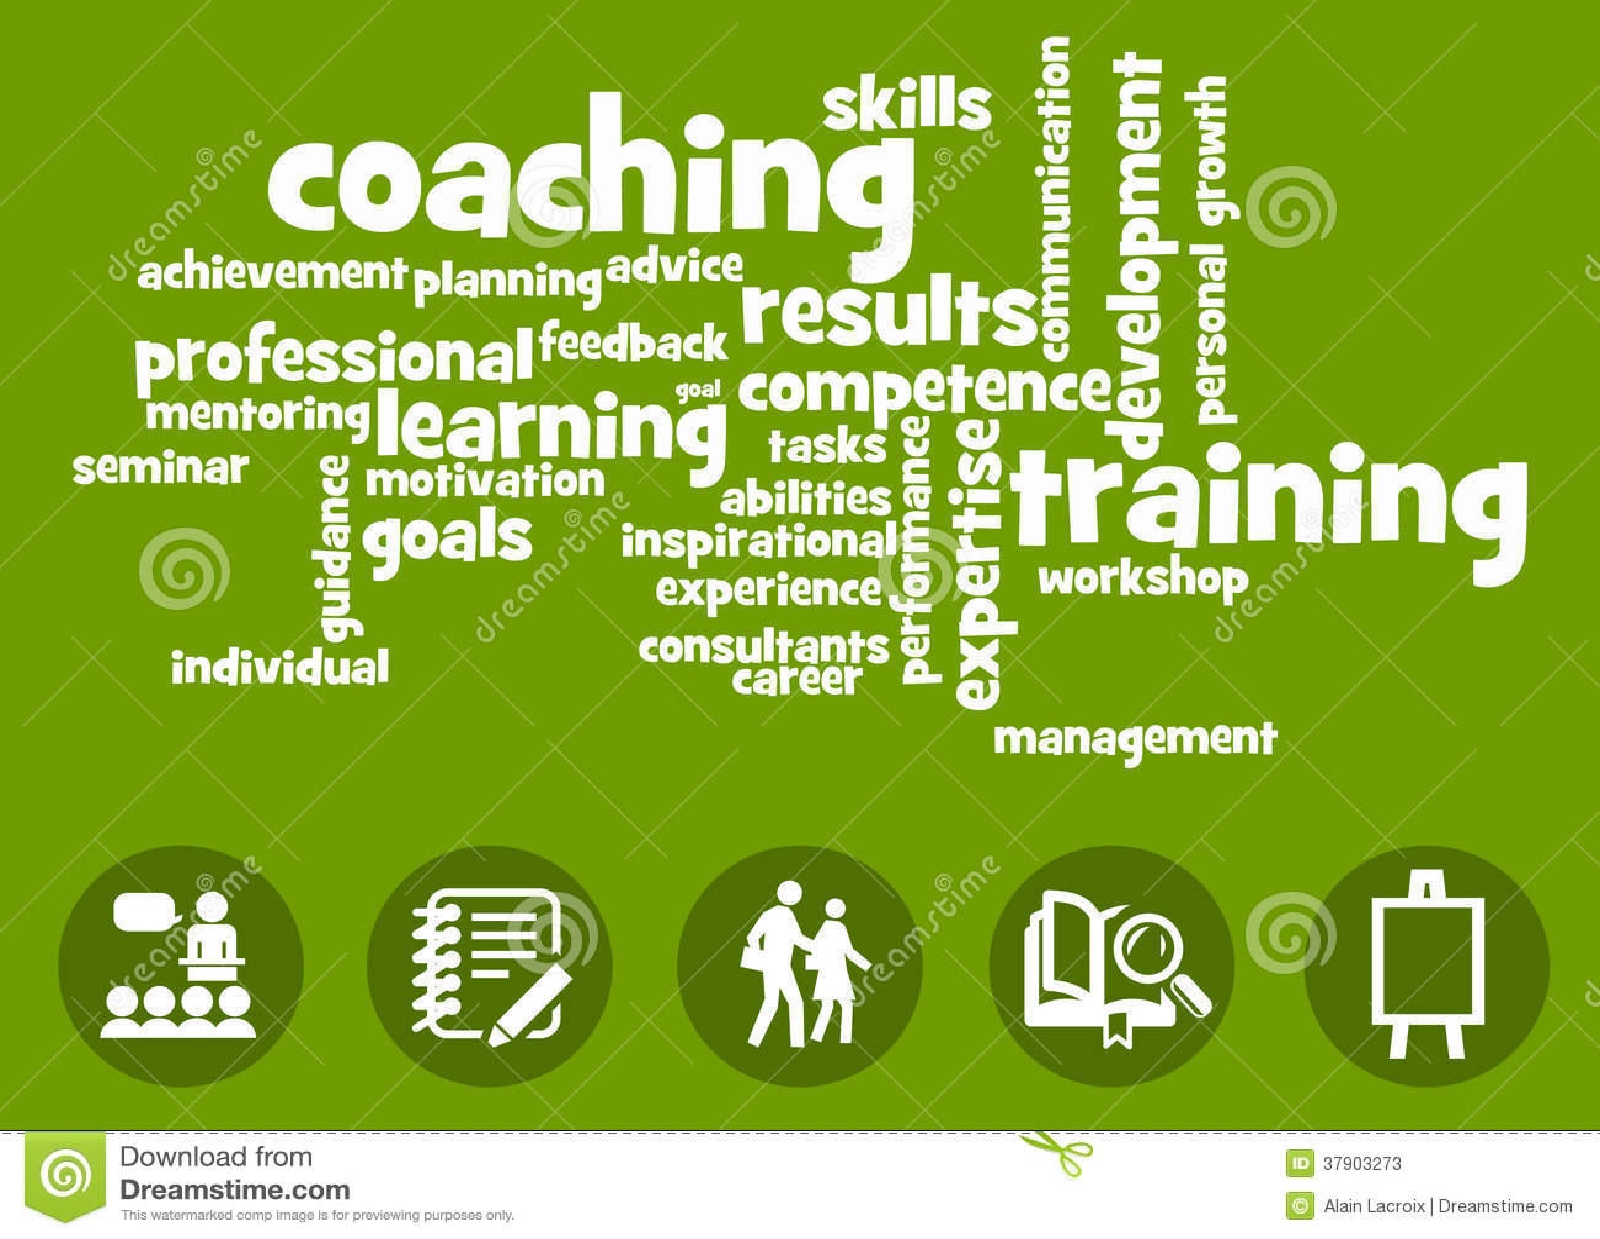 How To Design A Life Coaching Plan